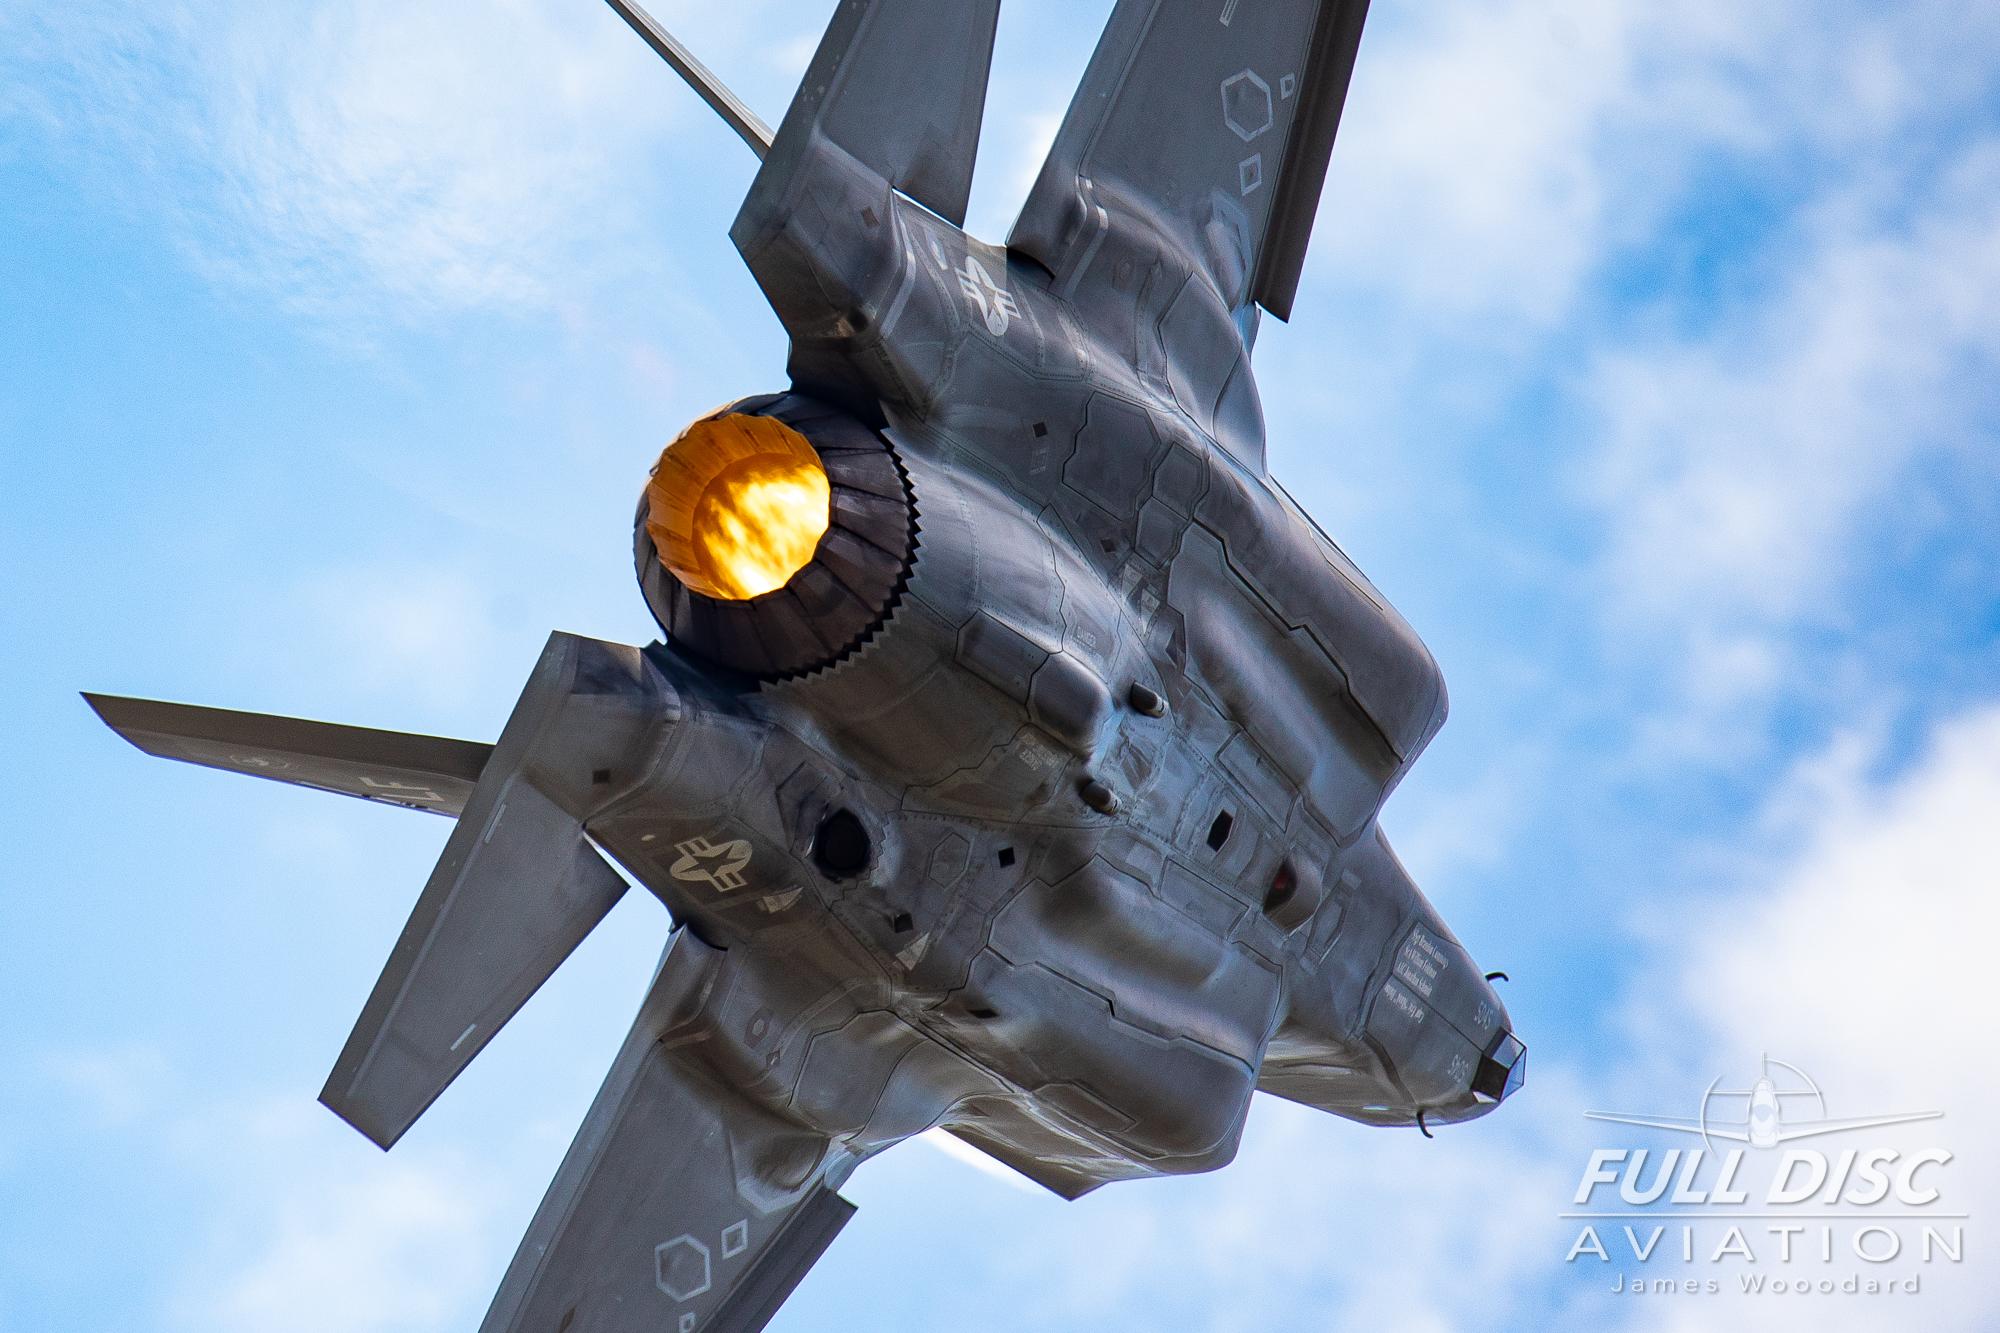 F35DemoTeam_FullDiscAviation_JamesWoodard-April 28, 2019-44.jpg